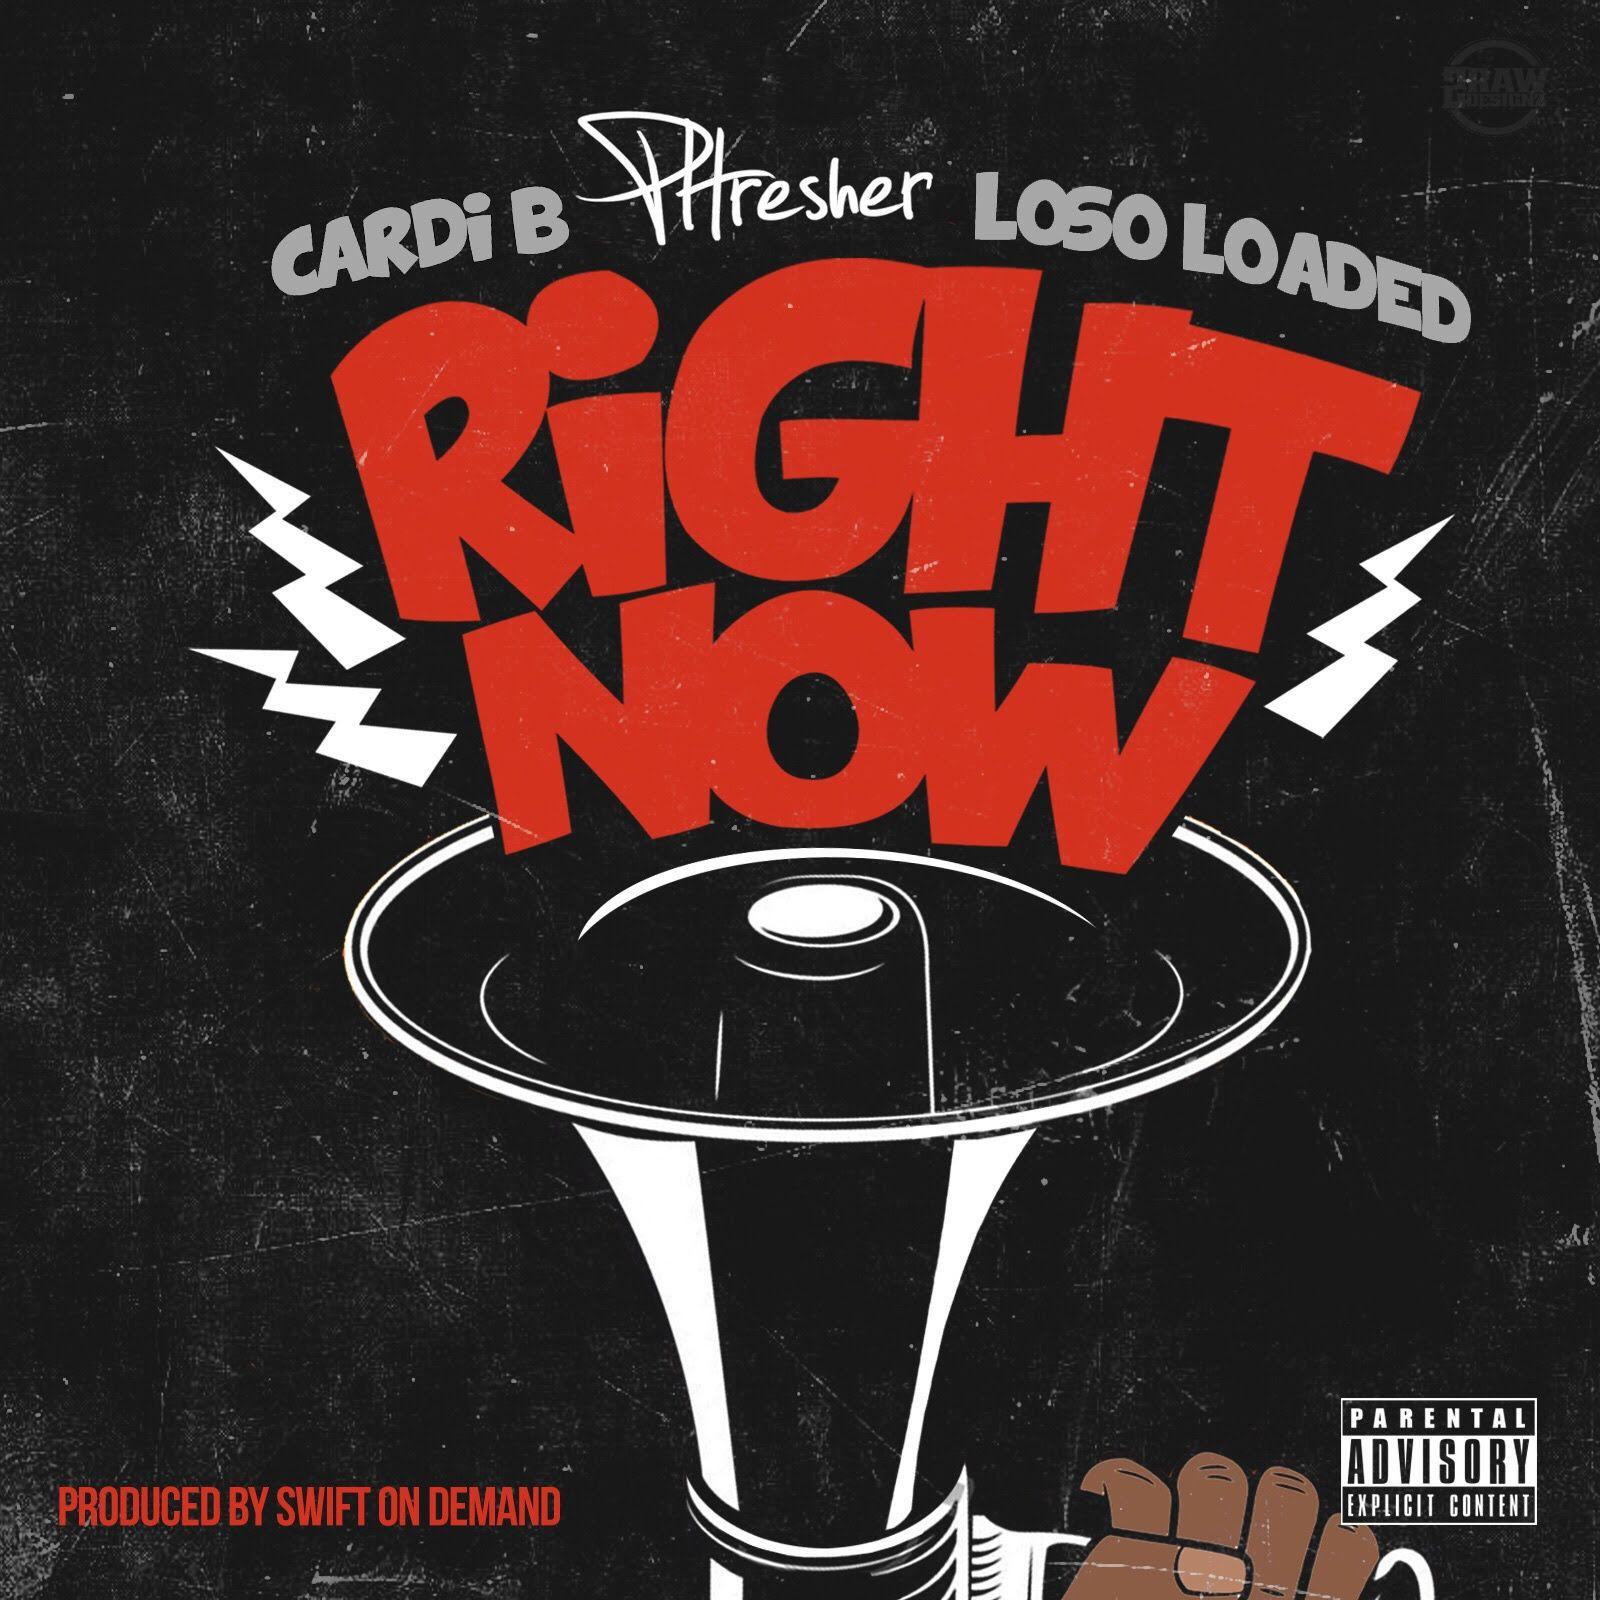 PHresher ft Cardi B & Loso Loaded